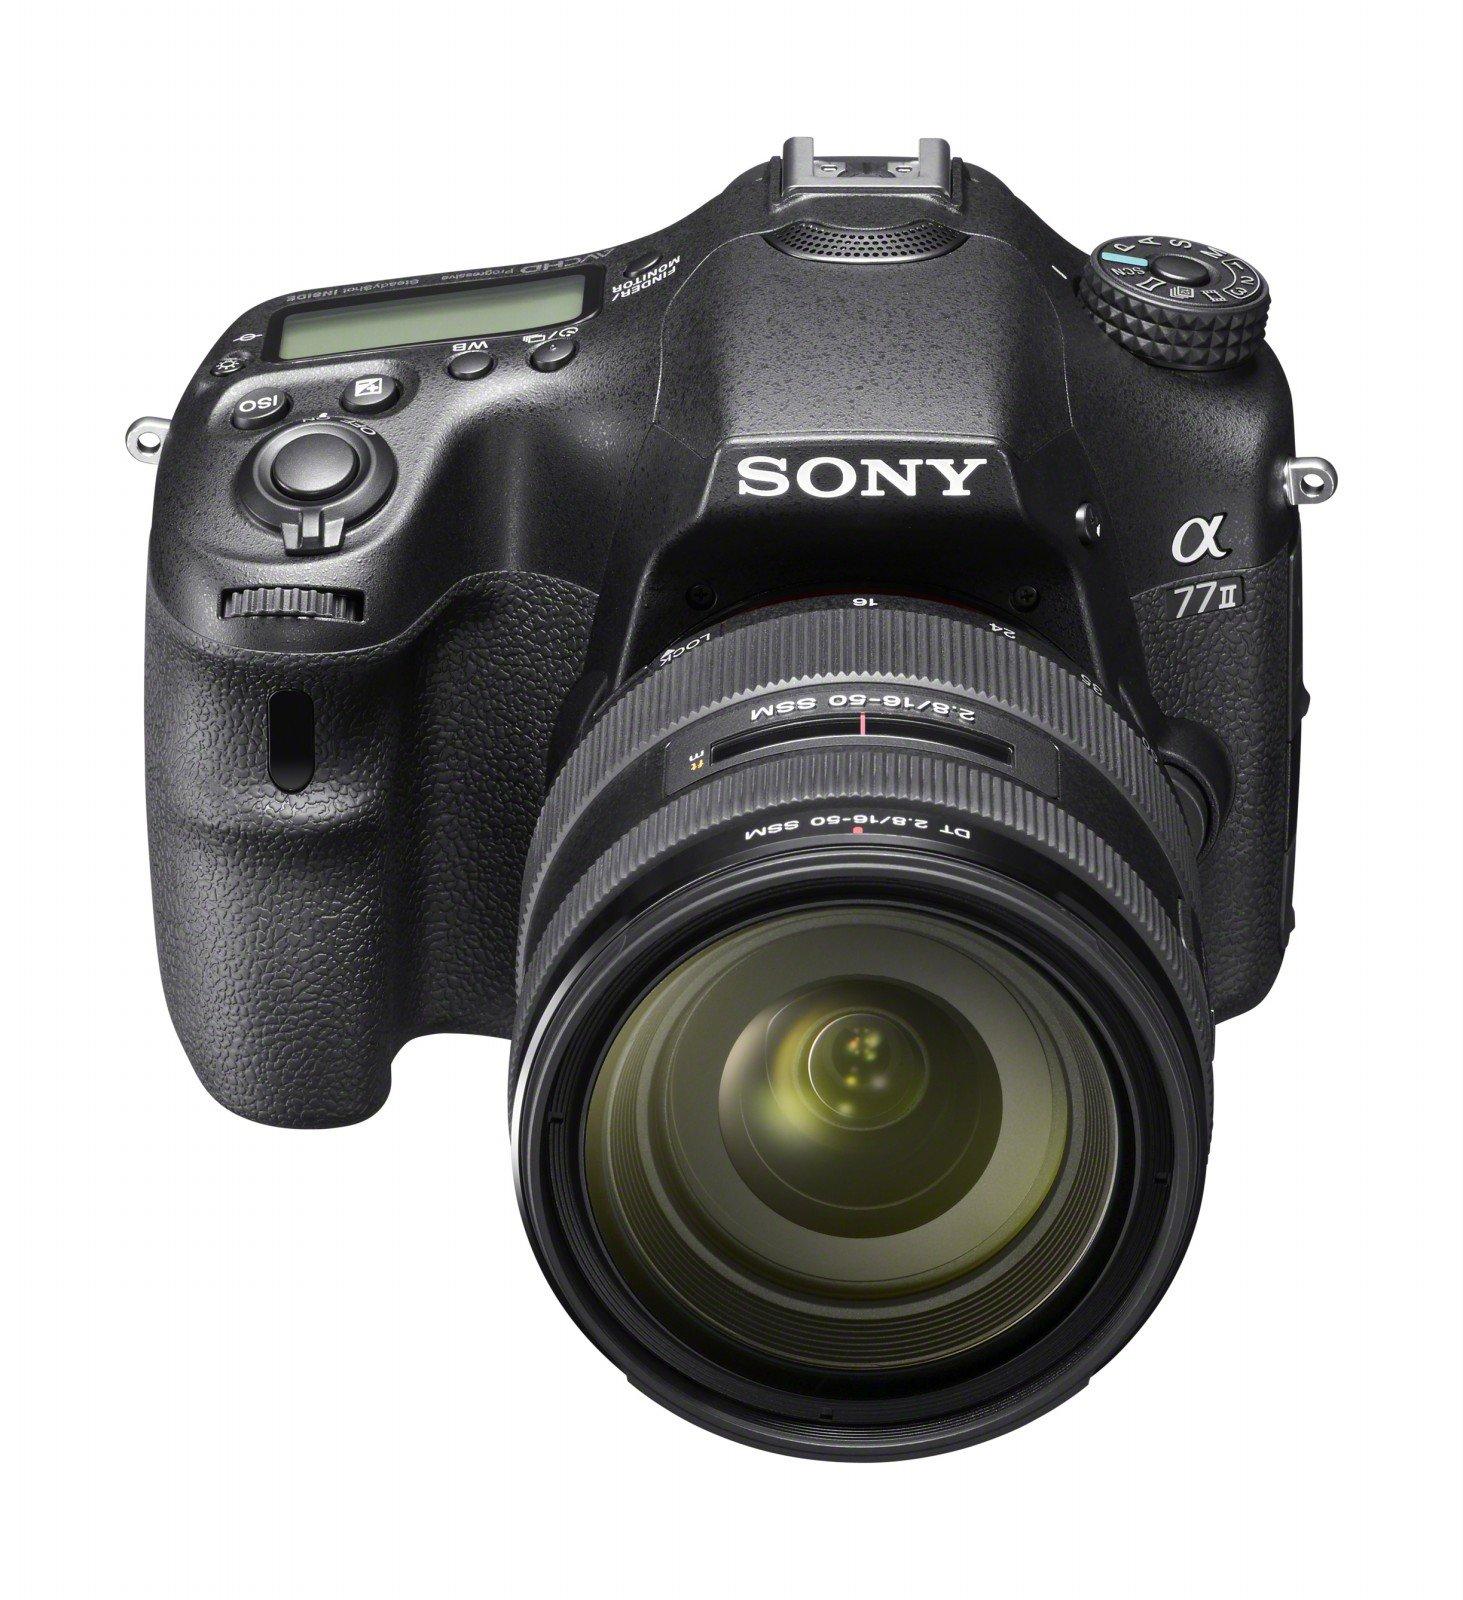 SONY Alpha SLT-A77 M2 + 16-50 mm